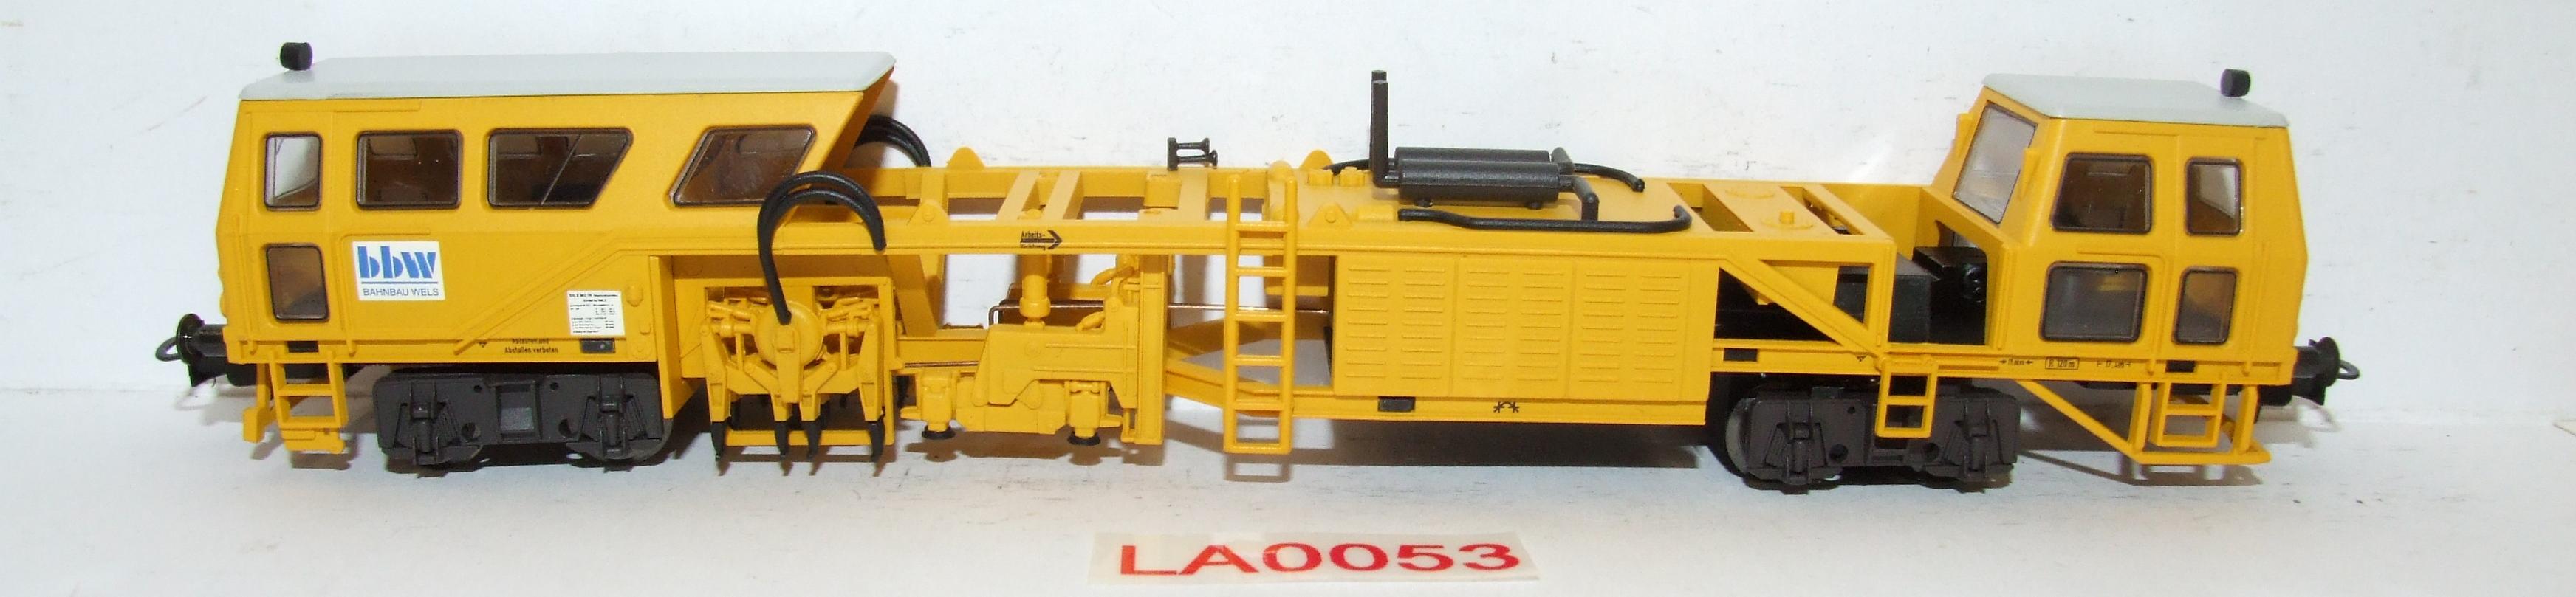 LA0053 Liliput H0 L 136111 Gleisstopfmaschine ÖBB Epoche IV in OVP